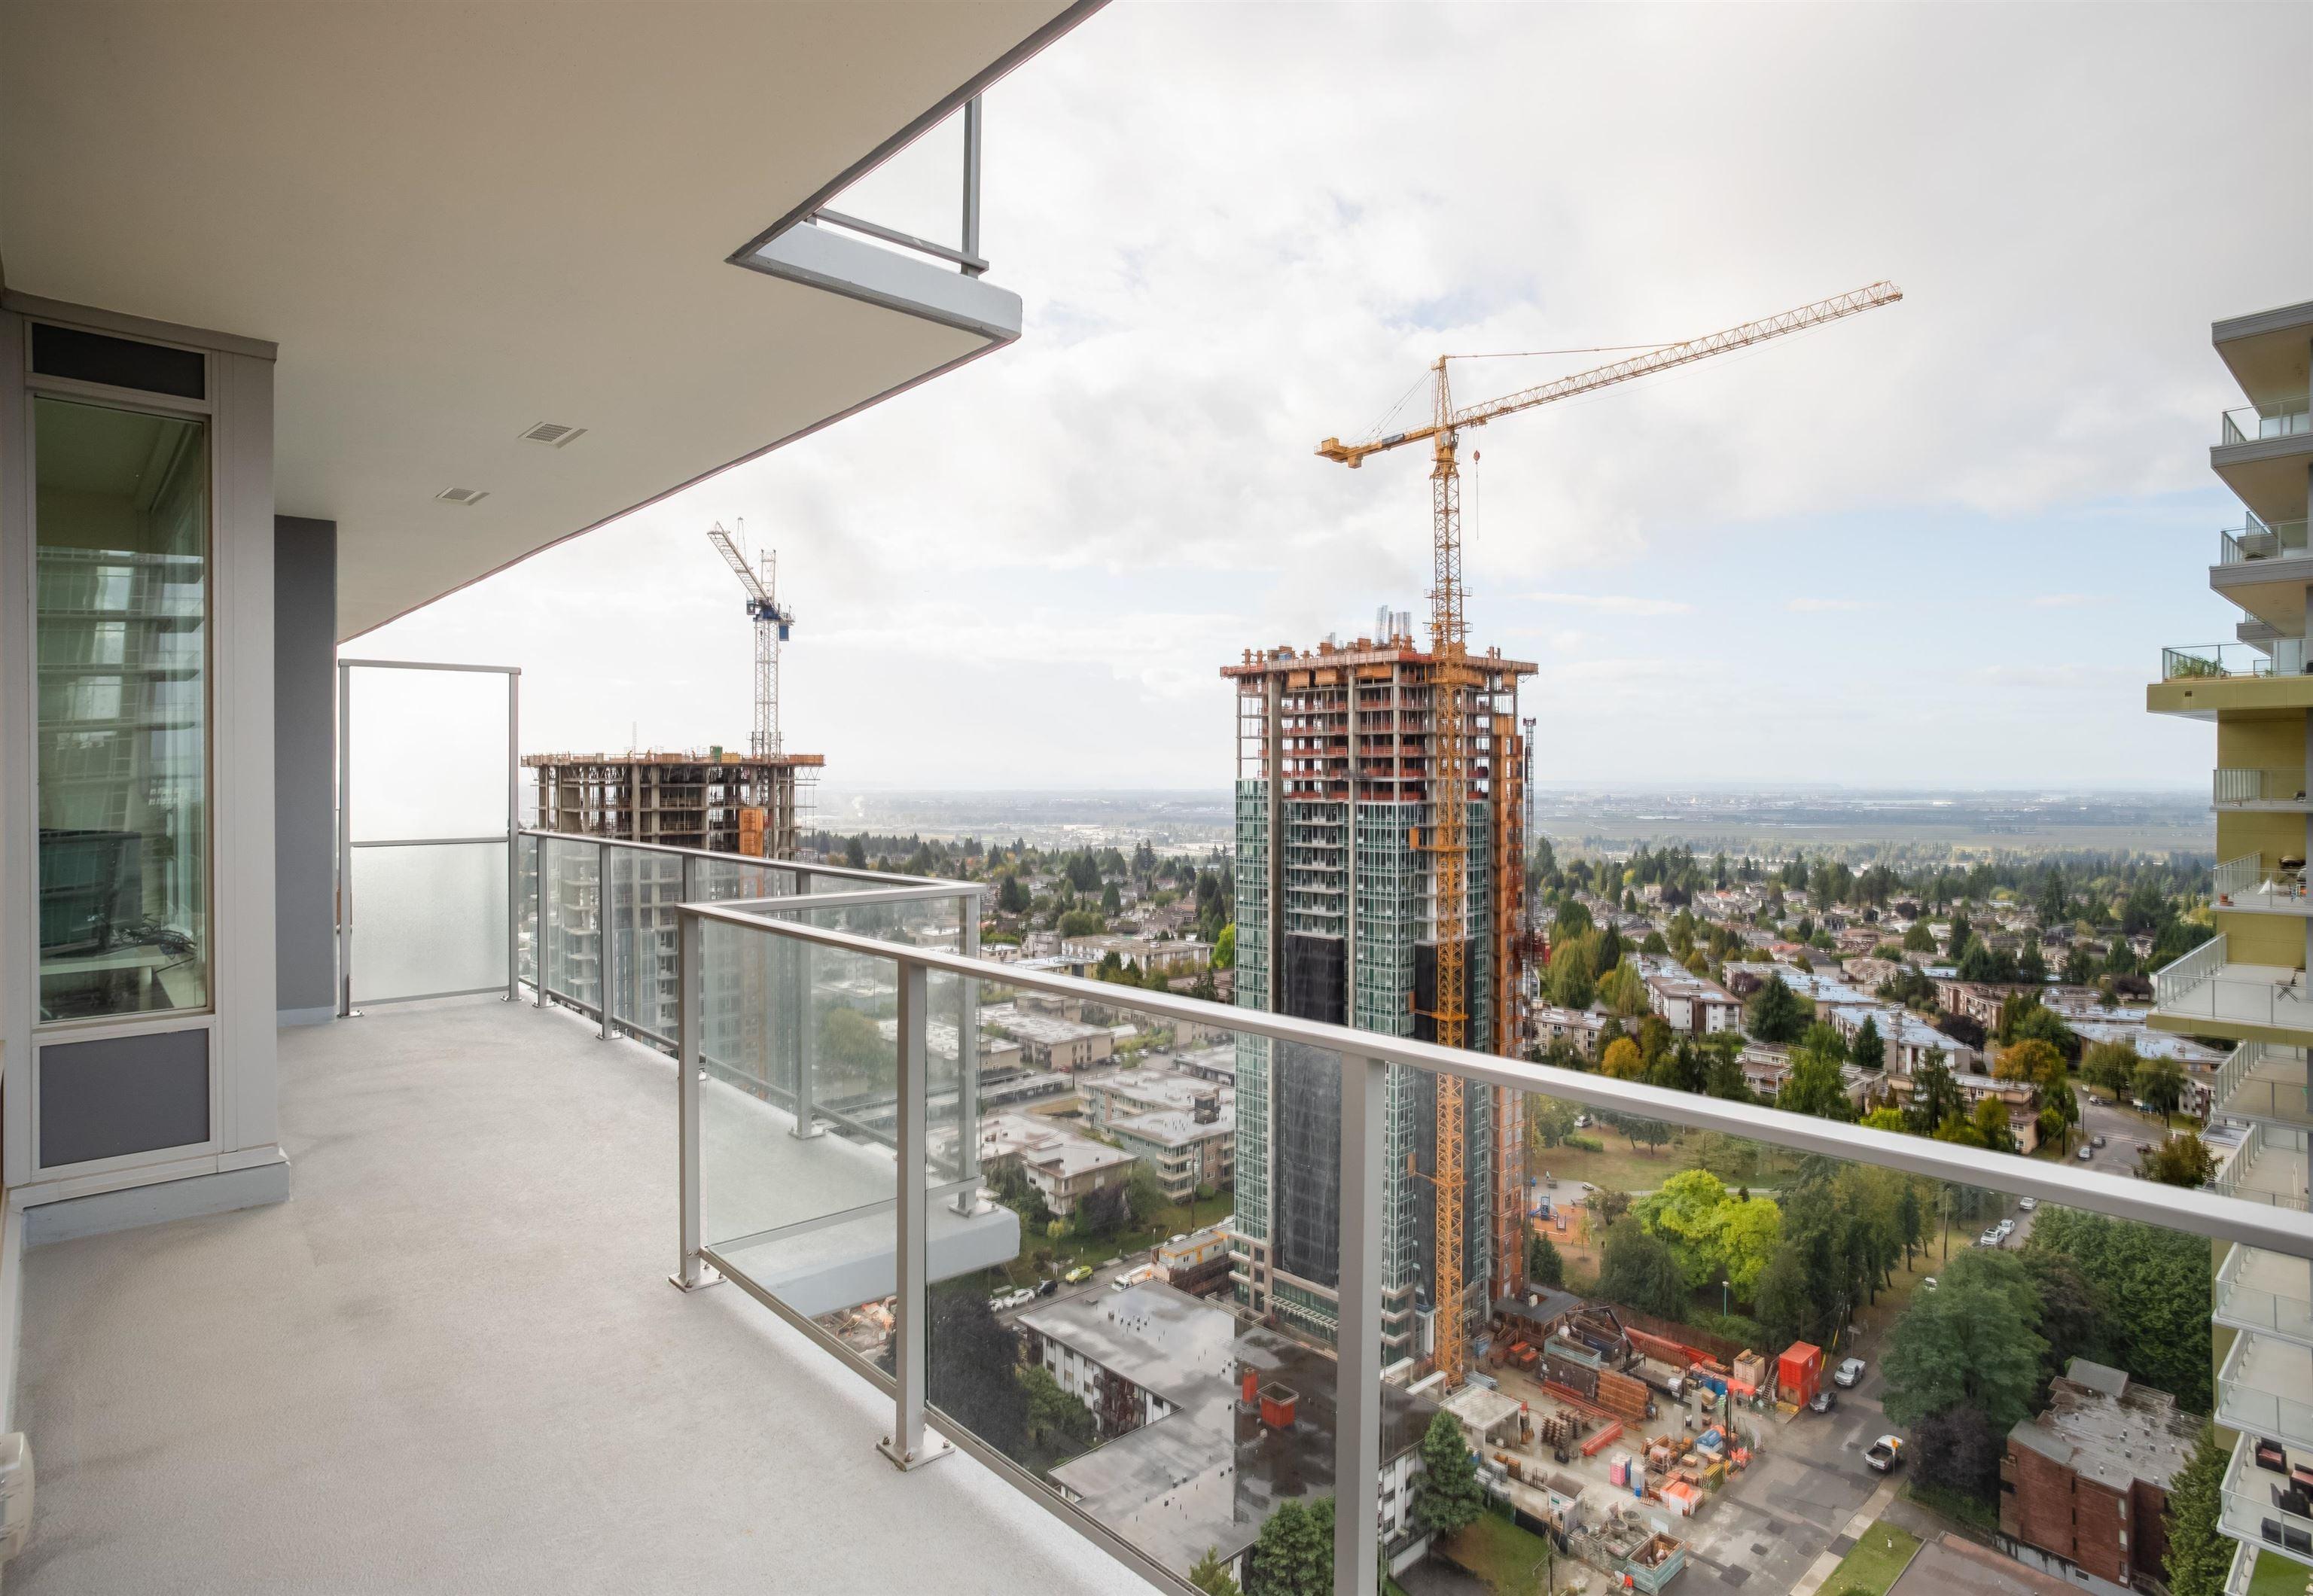 2206 6383 MCKAY AVENUE - Metrotown Apartment/Condo for sale, 2 Bedrooms (R2625647) - #21